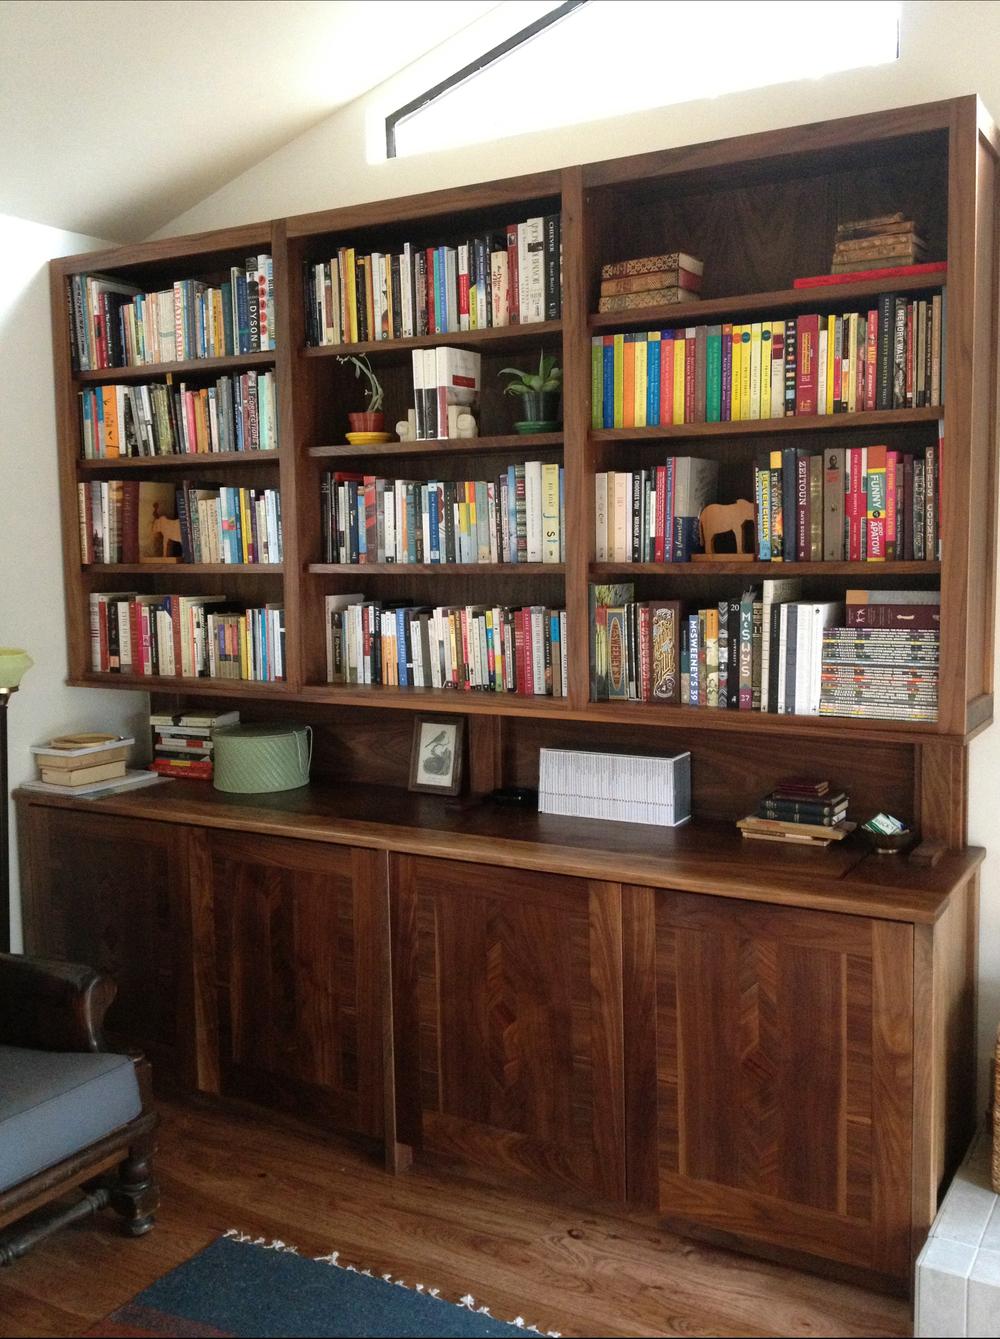 Built-in Cabinets/Bookshelves- Guerneville